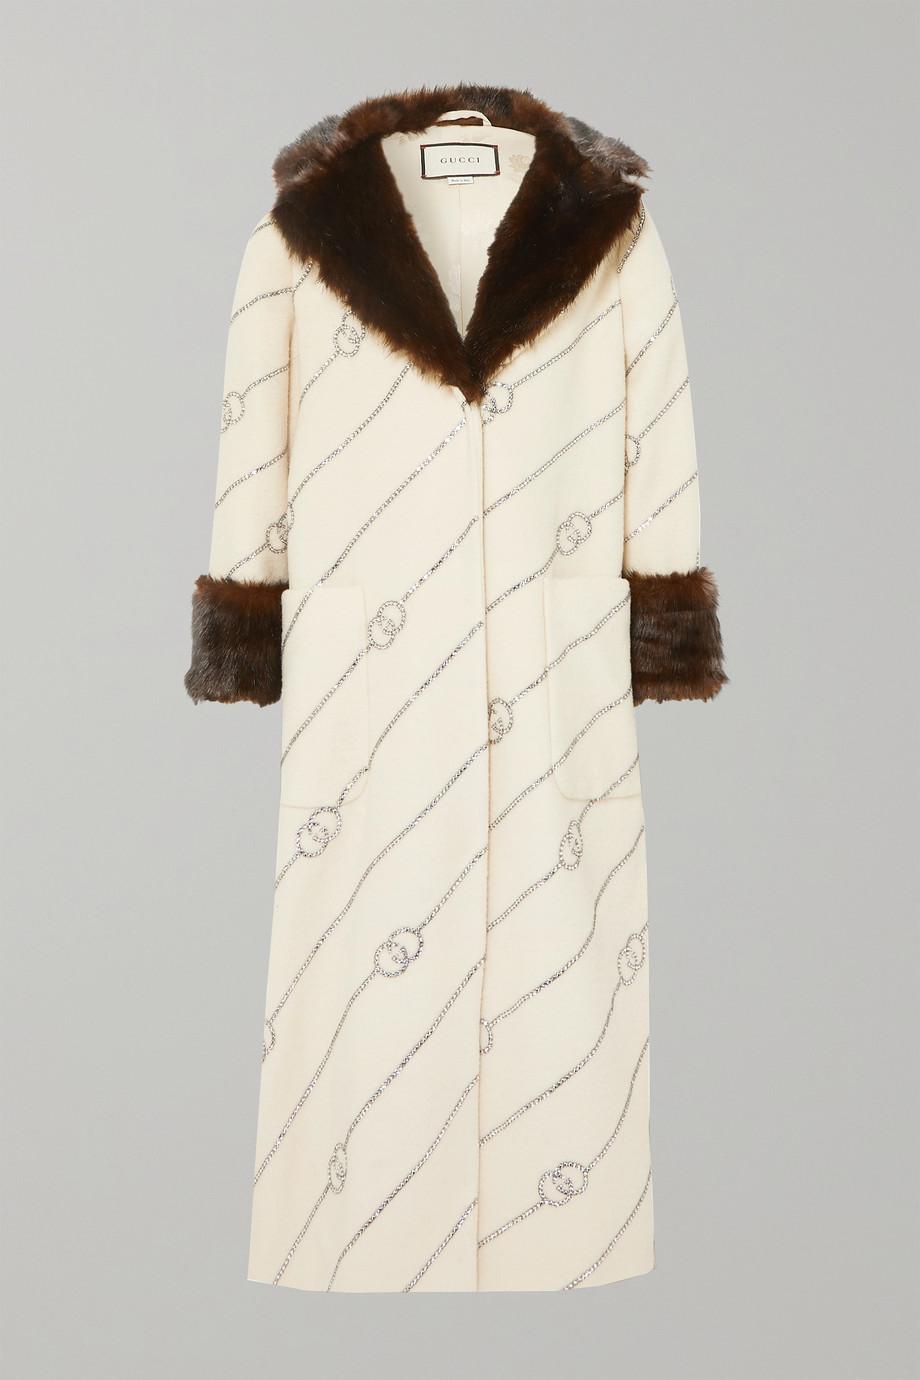 Gucci Faux fur-trimmed crystal-embellished wool-felt coat